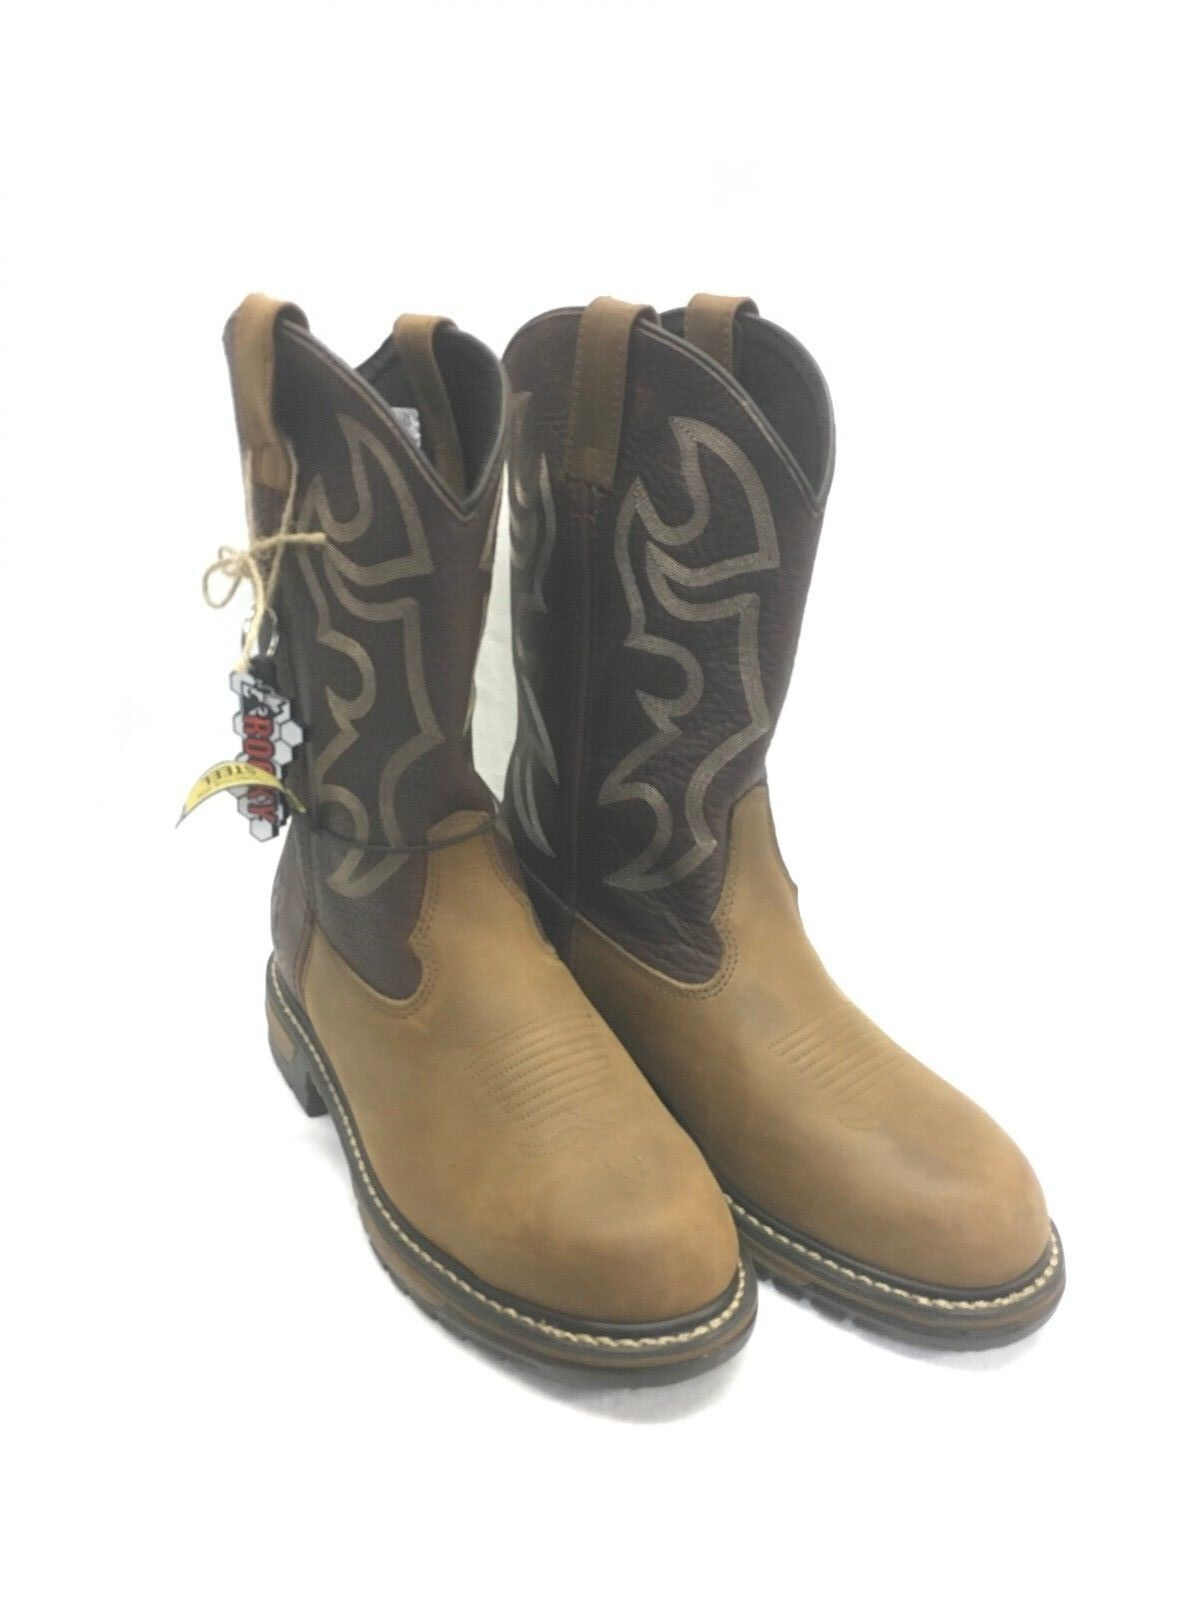 Men's Rocky Work Boots-Branson, Style FQ0002732